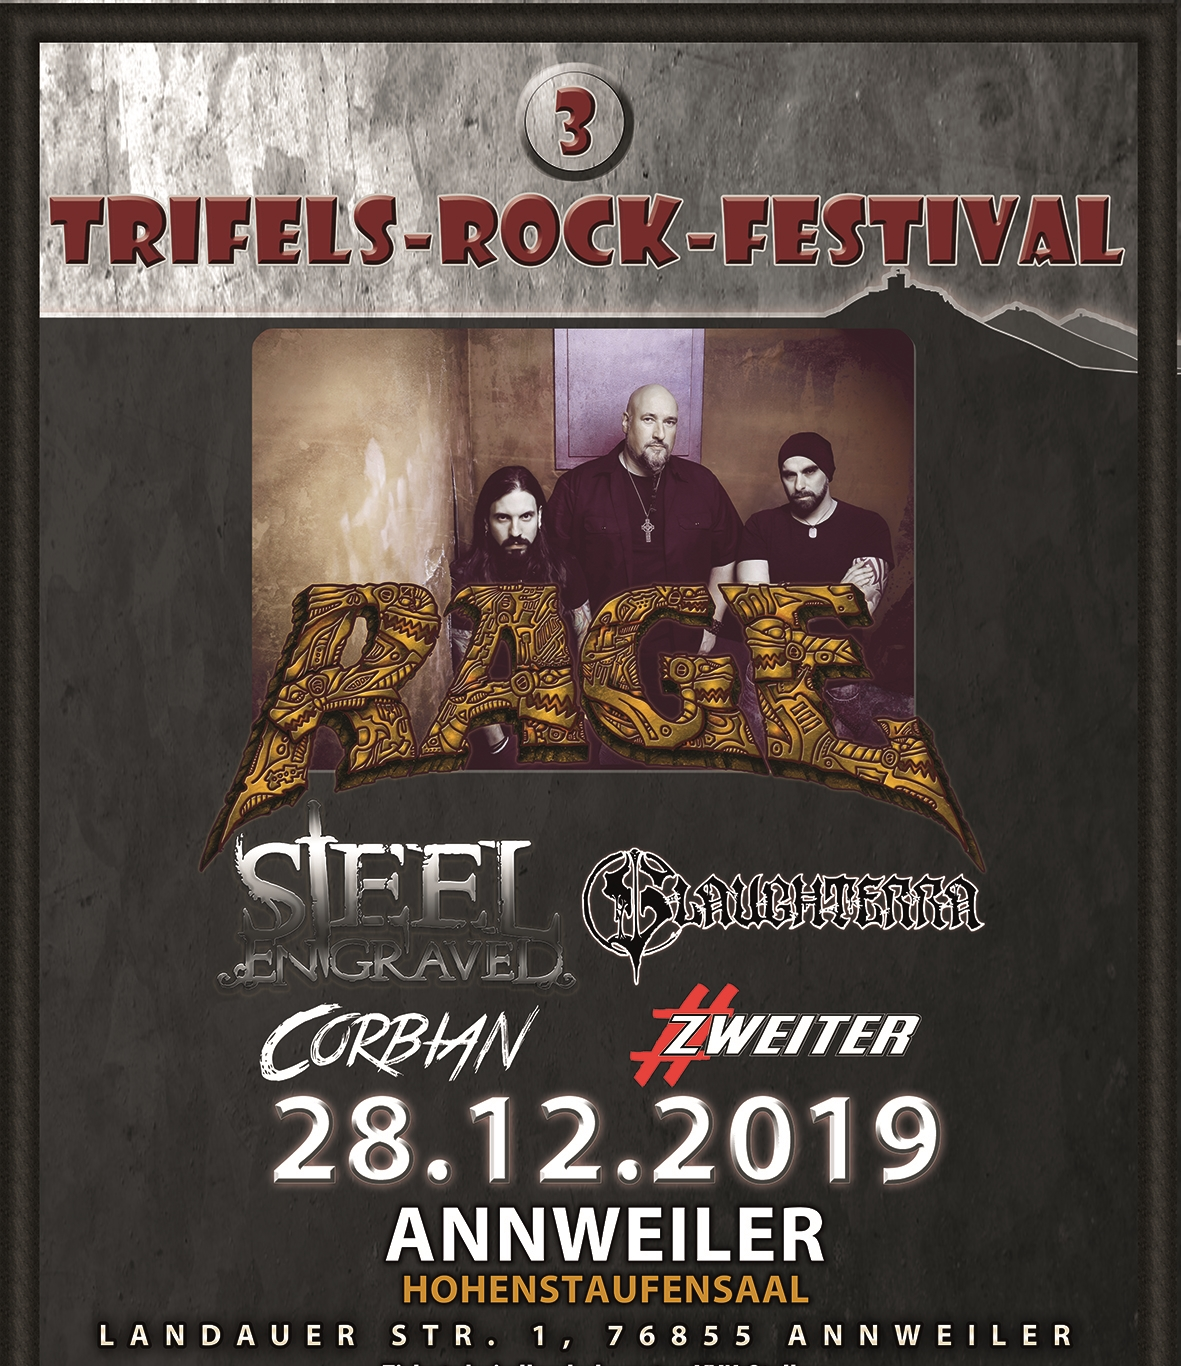 Annweiler - 3. Trifels-Rock-Festival